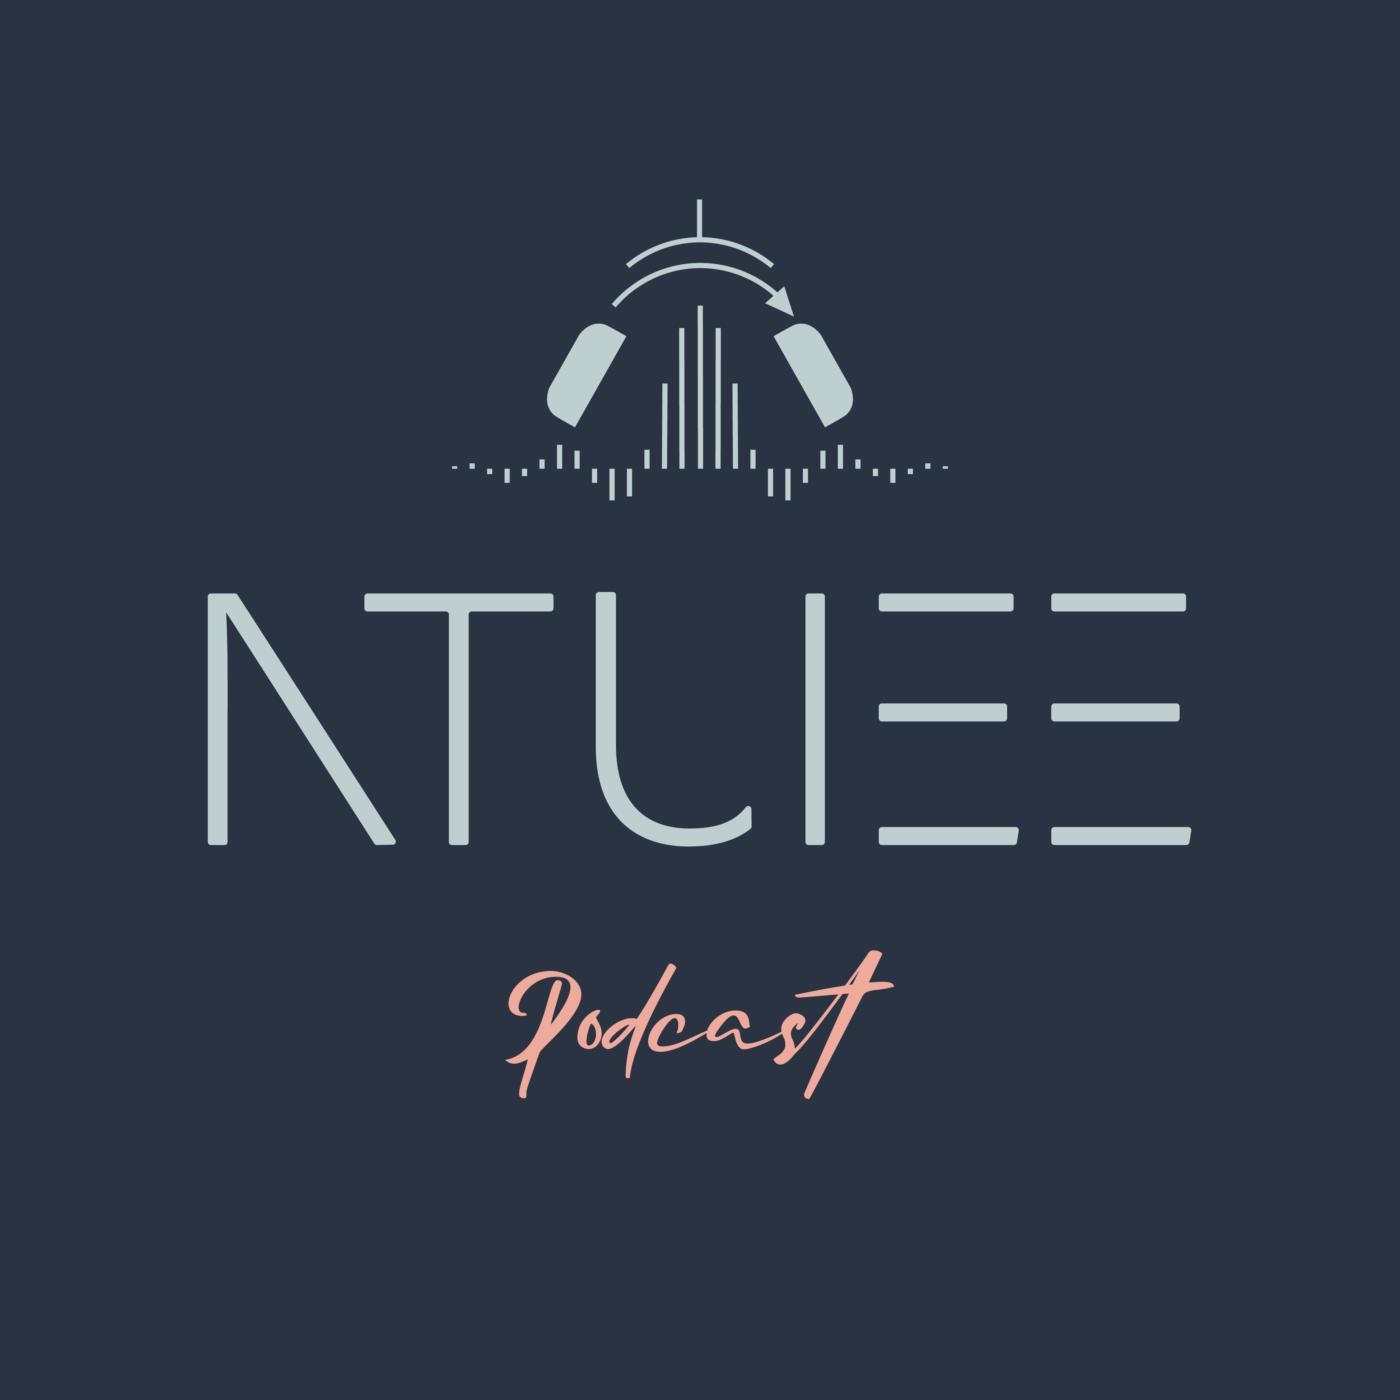 NTUEE Podcast 2-2 | 教授轉職創業家的契機 | 學界和業界思維不同之處 | 創未來科技為何不需要募資 | 過程中遭遇的瓶頸